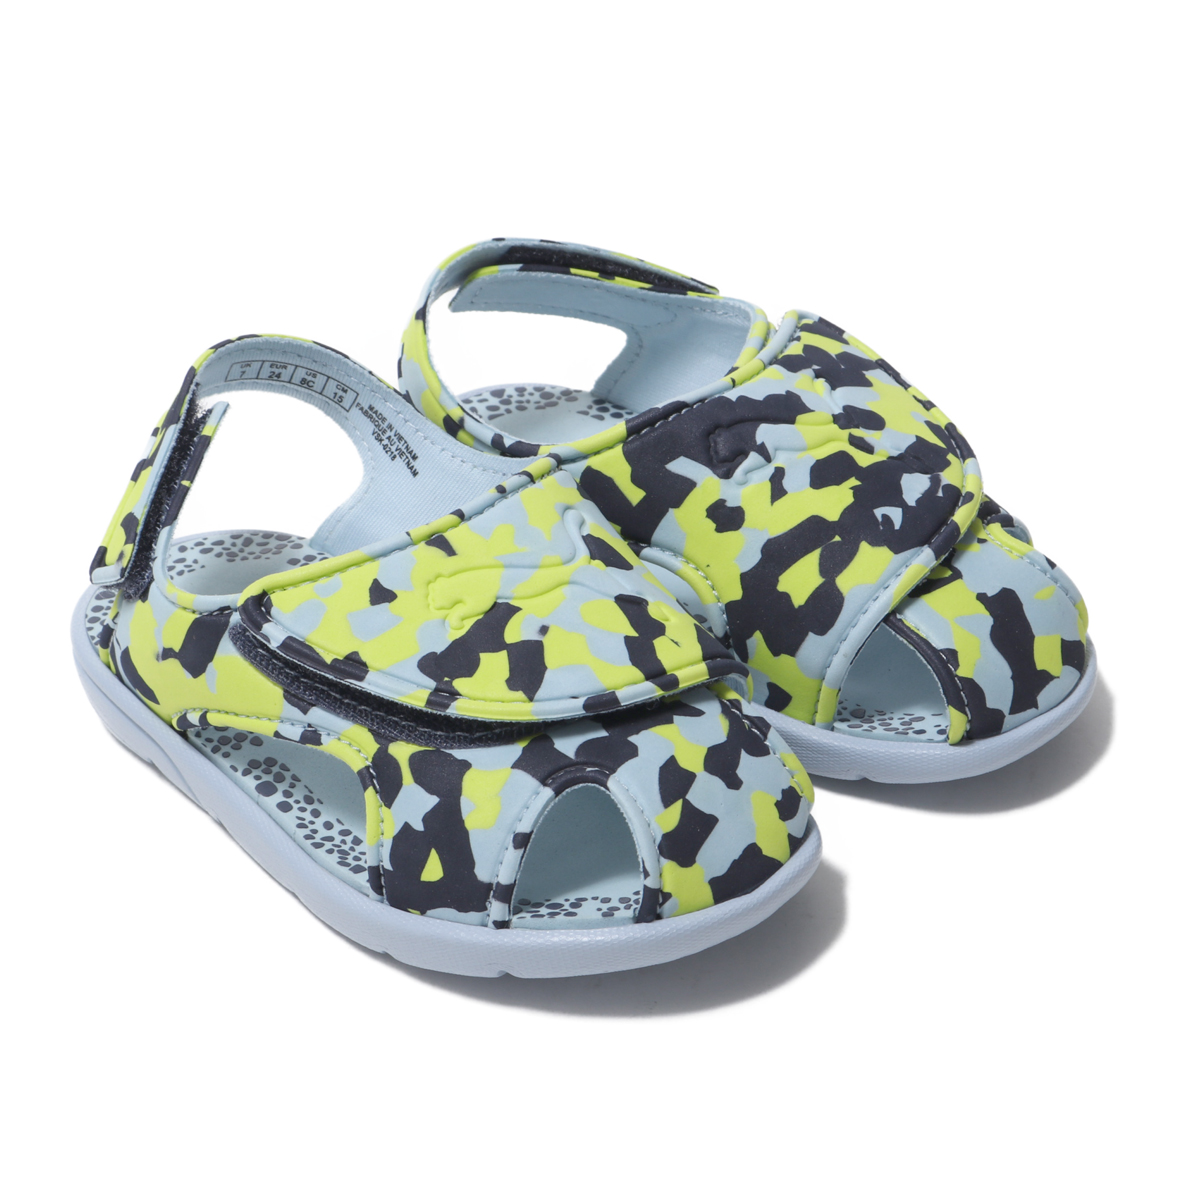 973479c03b PUMA SUMMER SANDAL 2 CAMO INFANT (PEACOAT) (Puma summer sandals 2 カモインファント)